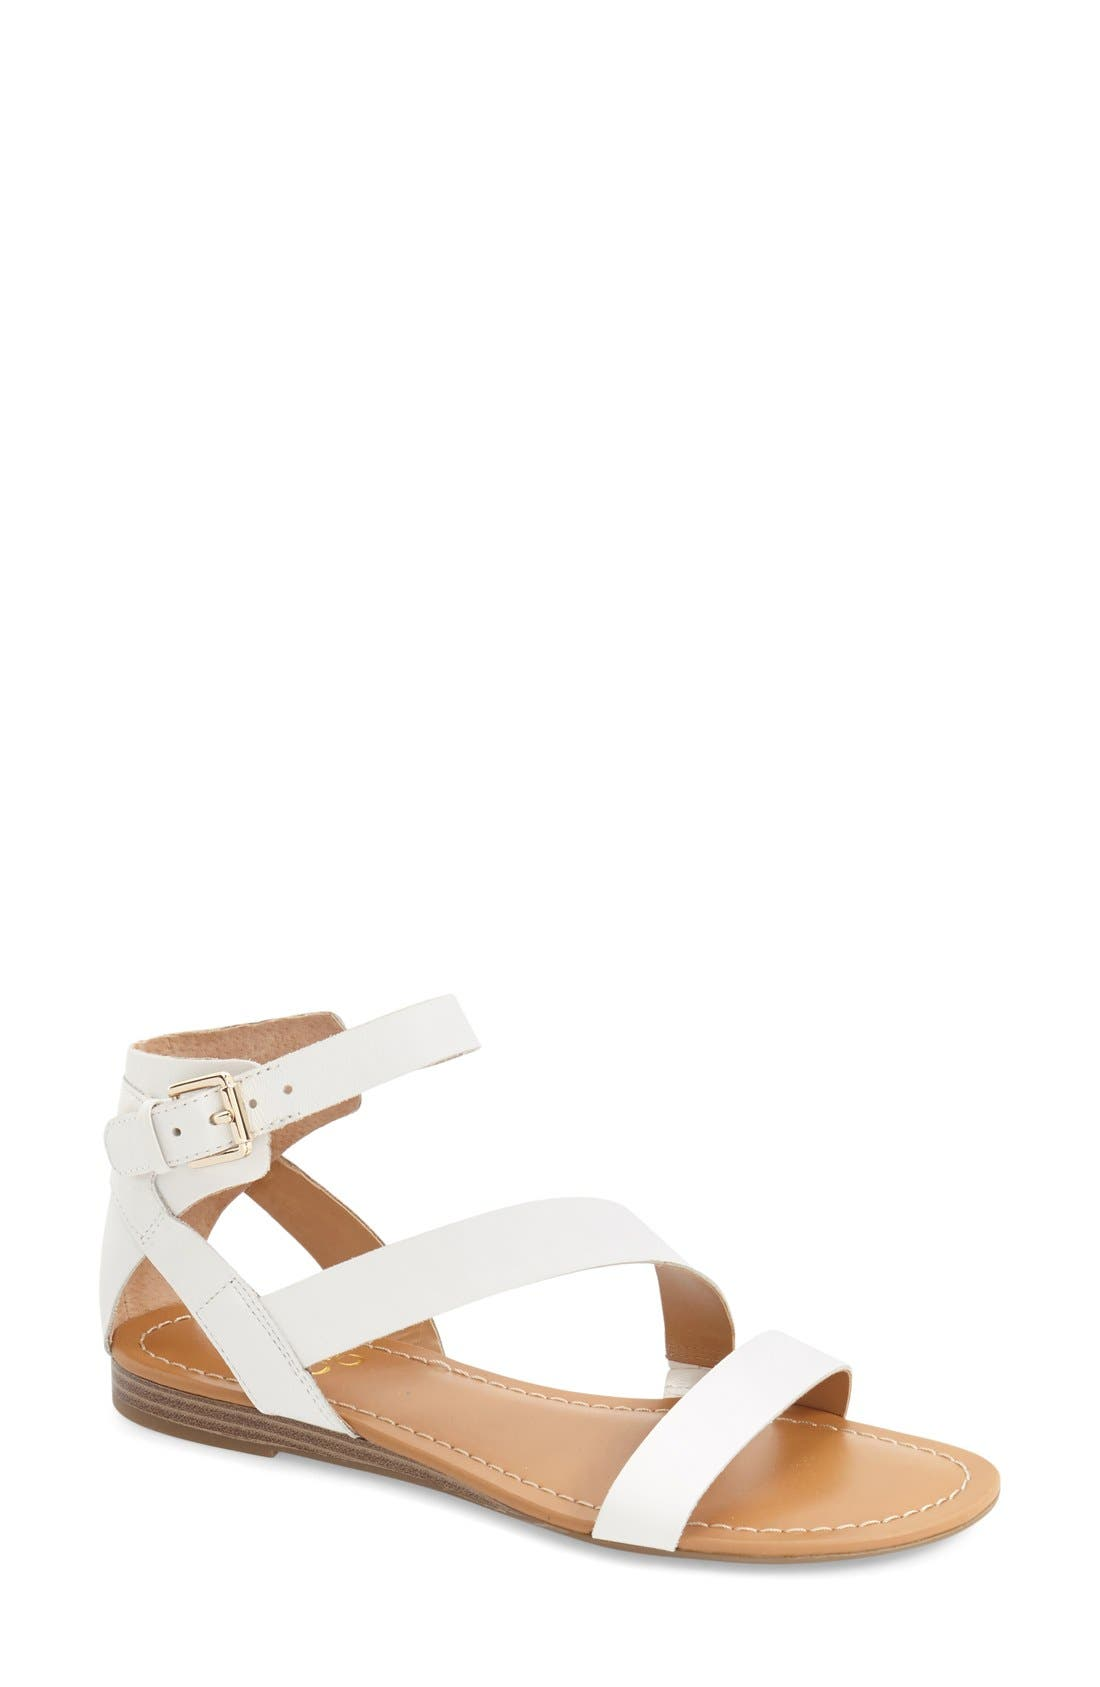 Main Image - Franco Sarto 'Gracie' Ankle Strap Sandal (Women)